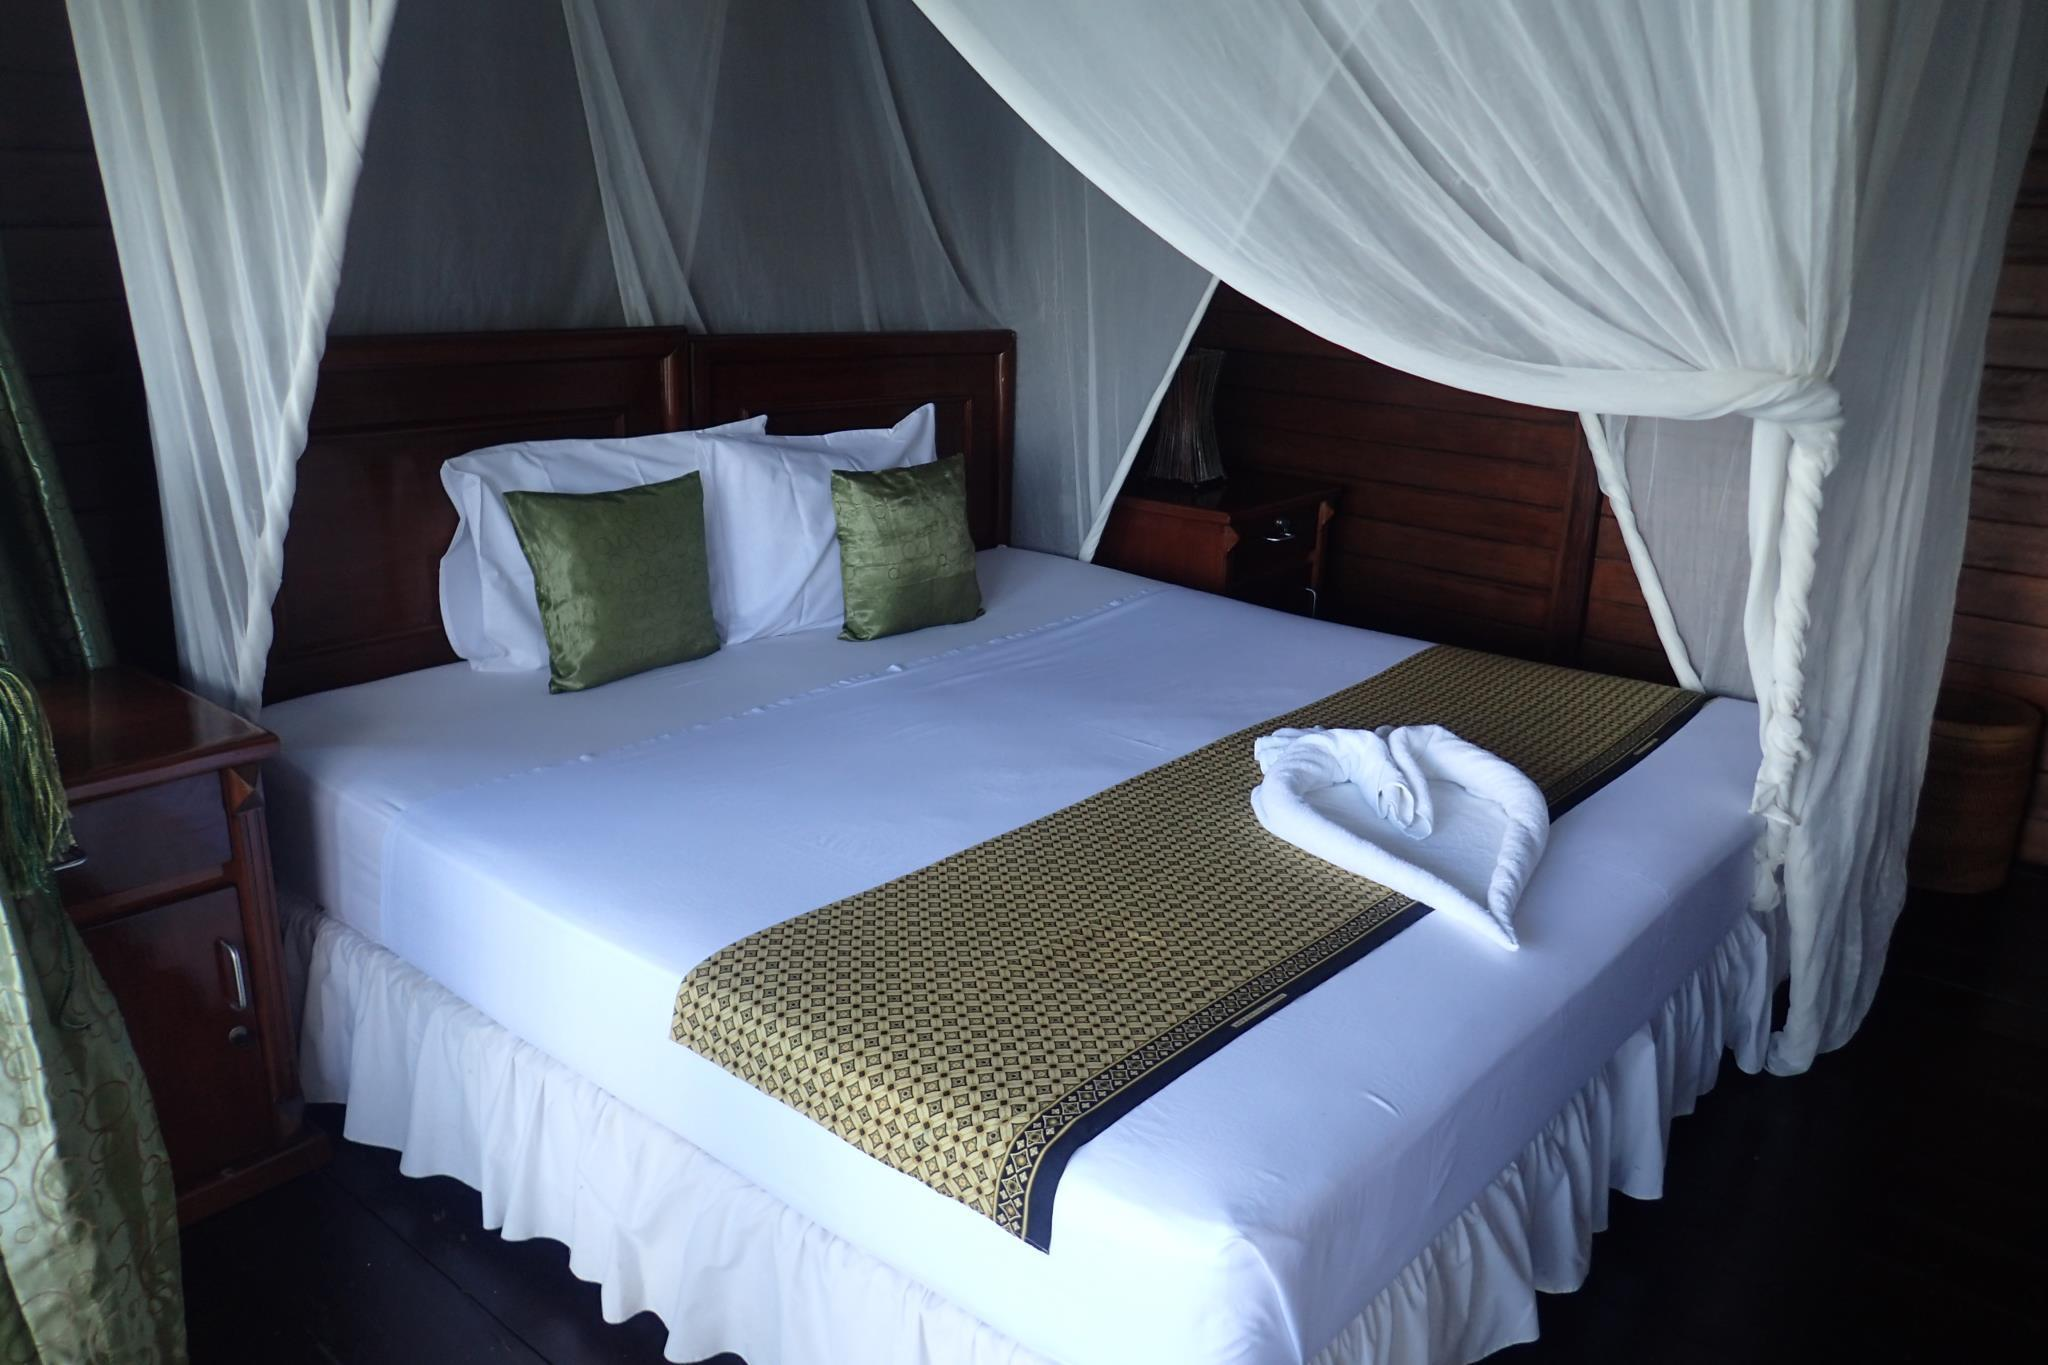 Hotel Froggies Divers Lembeh - Kelurahan Mawali,Kec lembeh Utara - Bitung